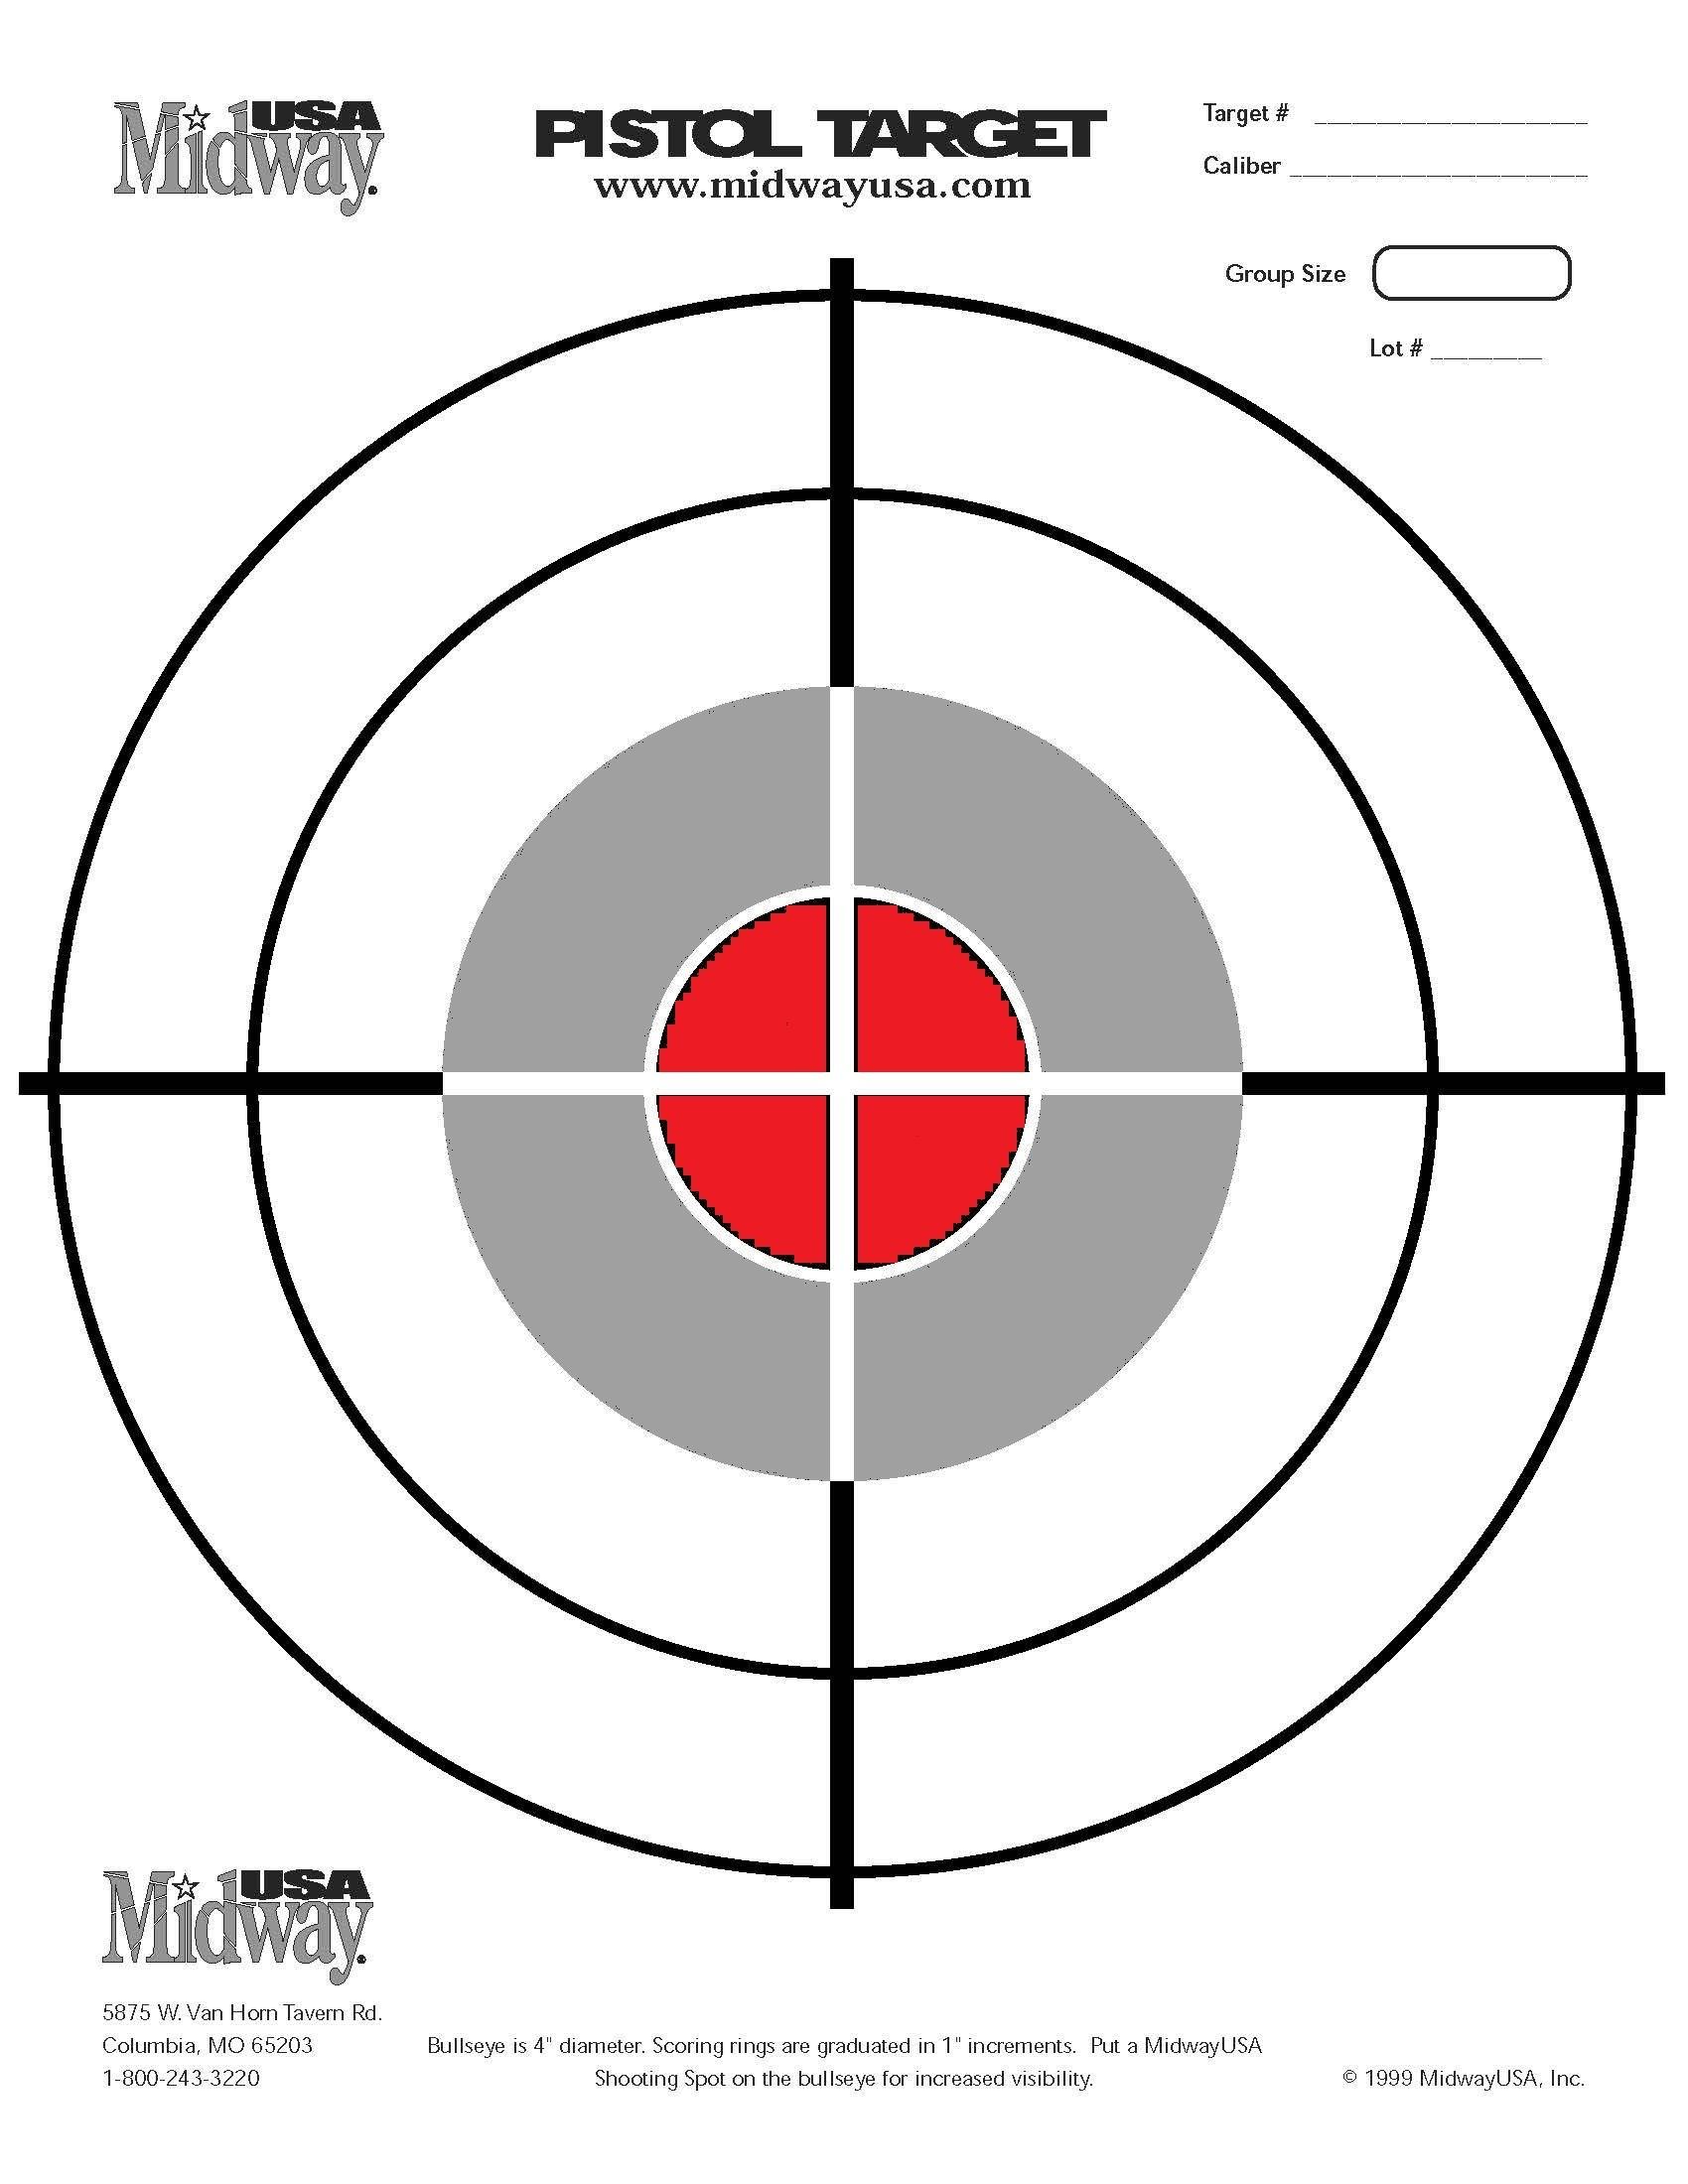 60 Fun Printable Targets | Kittybabylove - Free Printable Pistol Targets